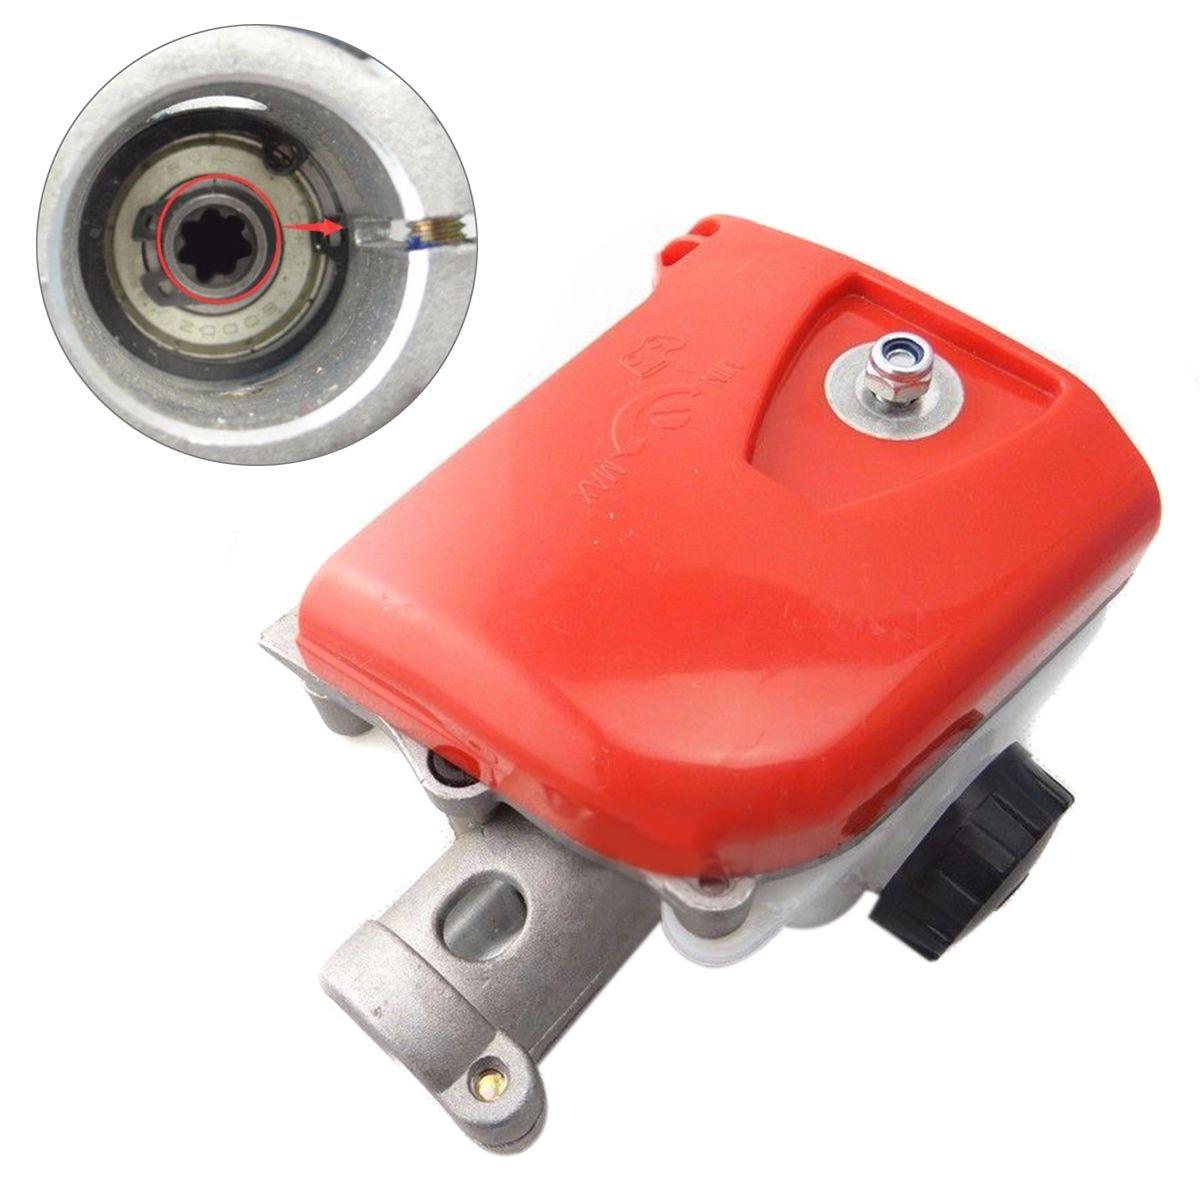 DWZ 26mm 7 Spline Pole saw Tree Cutter Chainsaw Gearbox Gear head Tools Orange&White